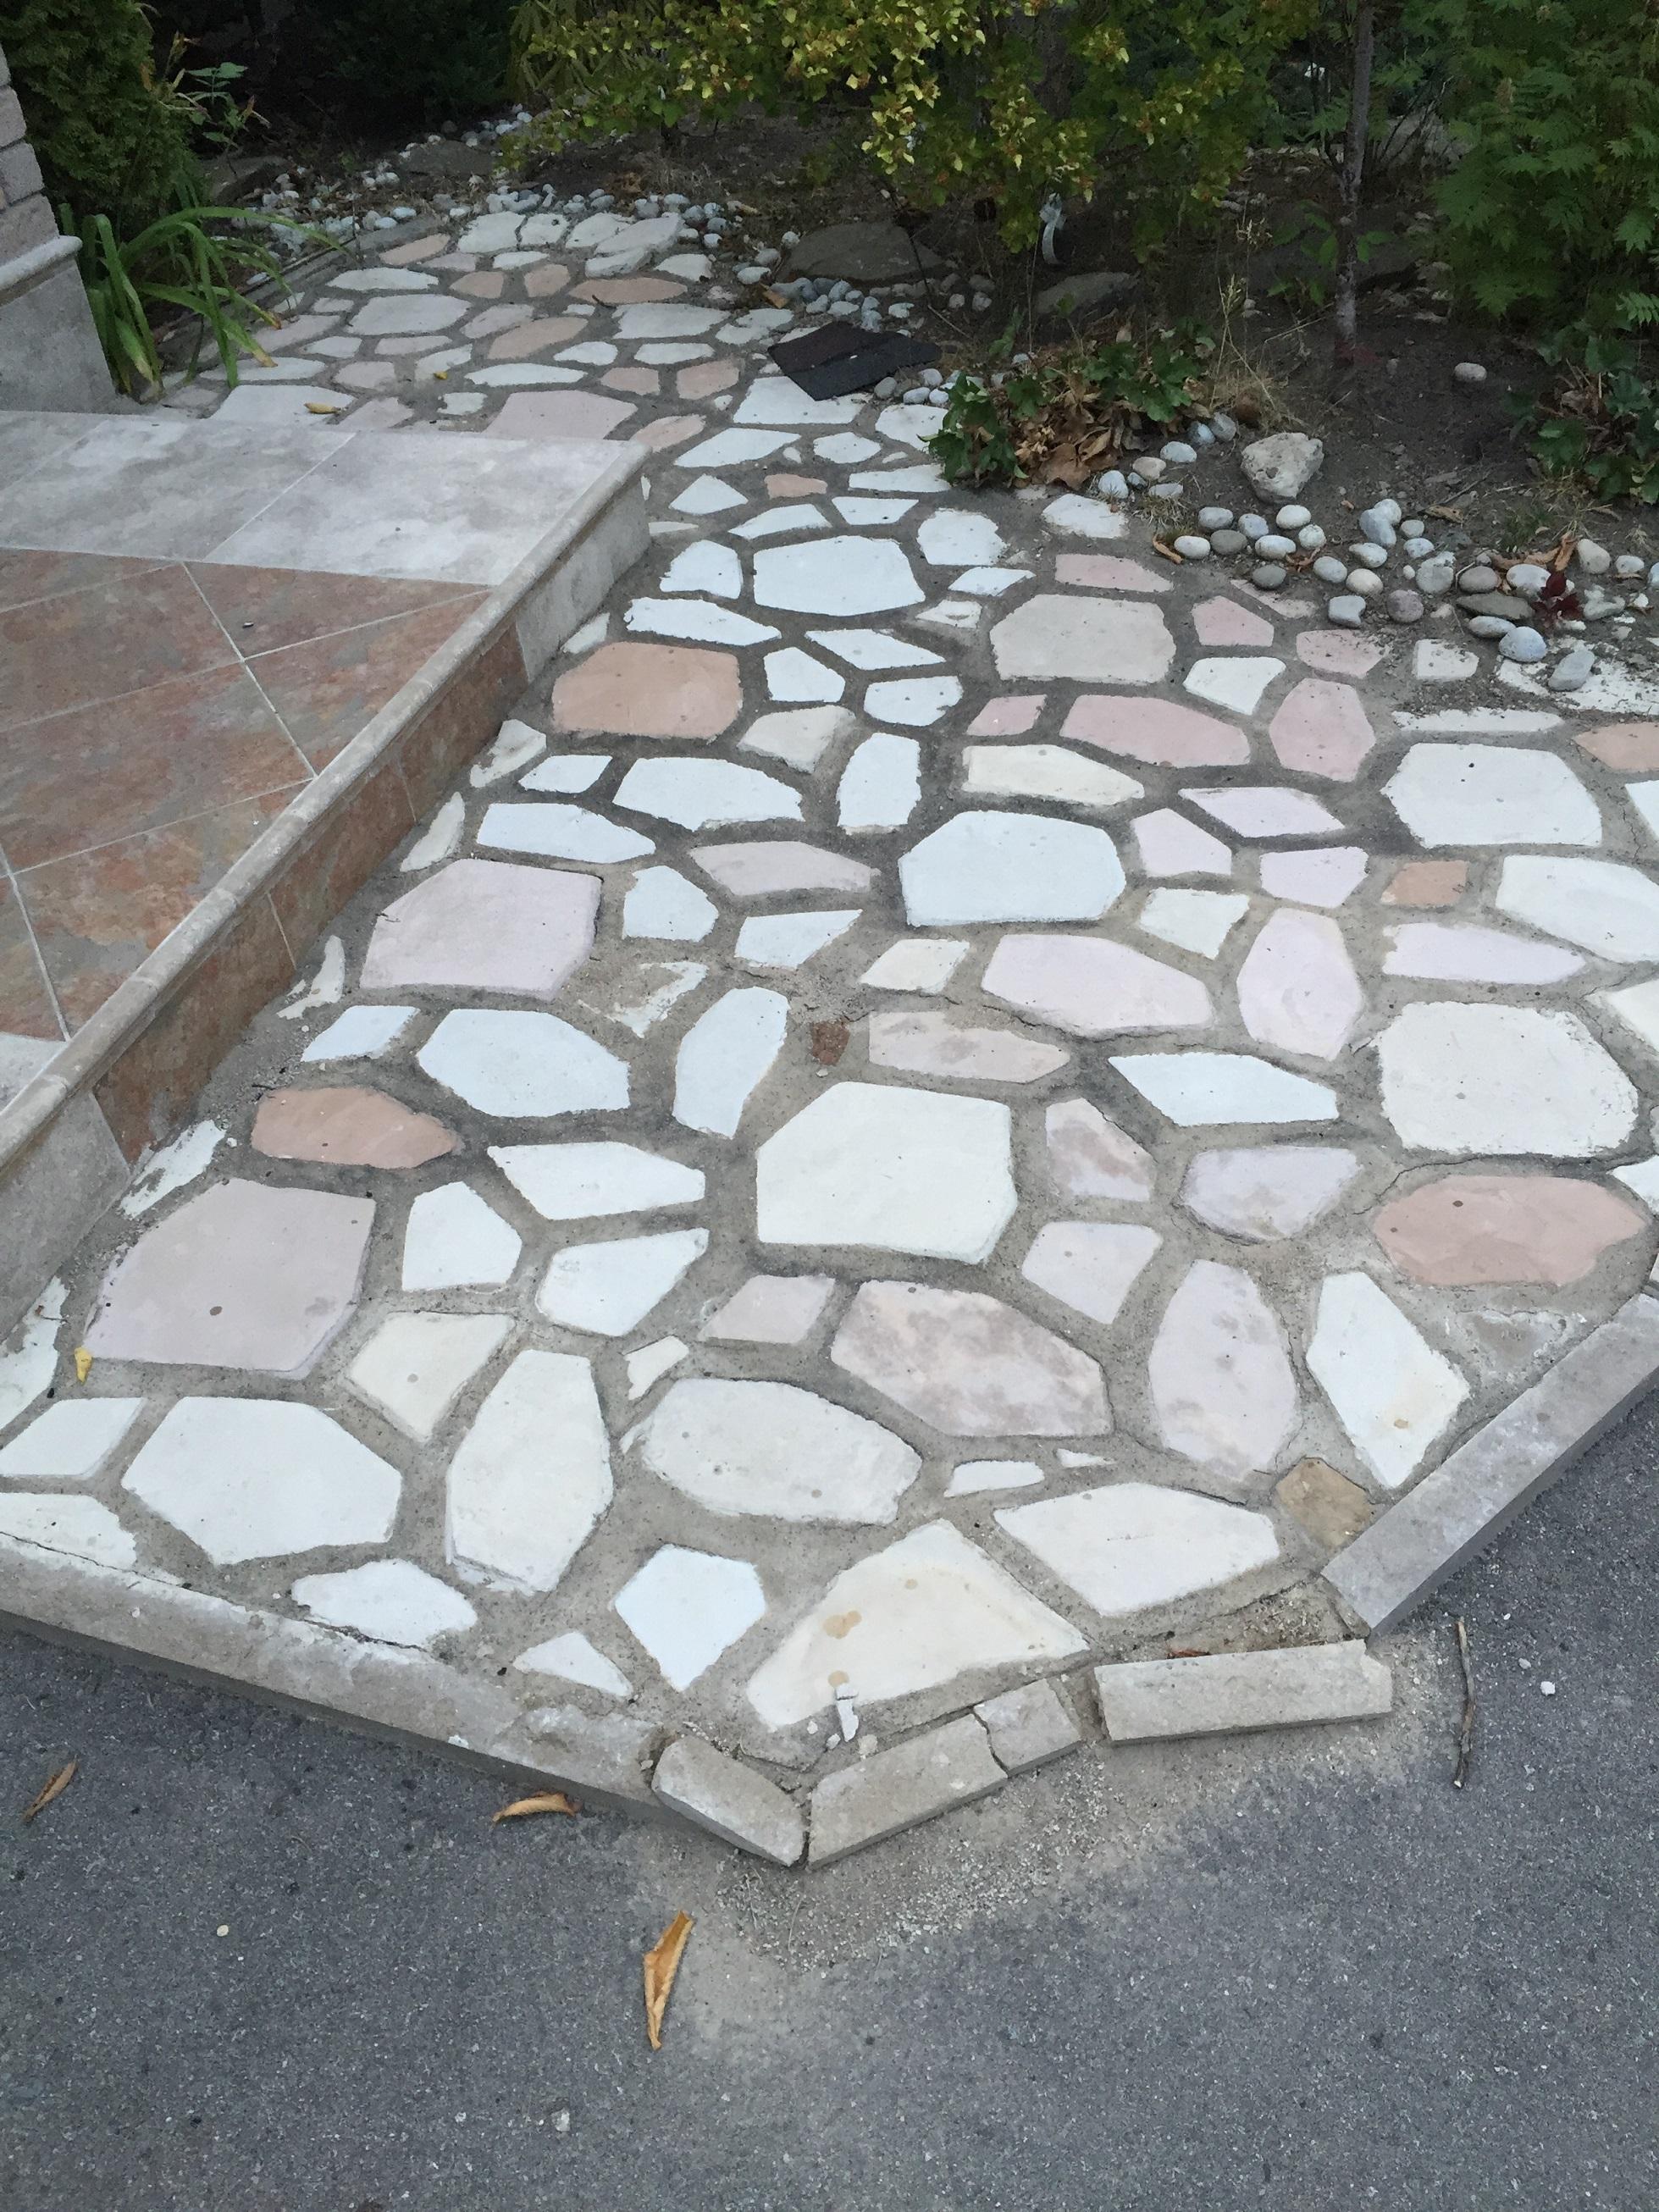 Repairing Loosen Patio Flagstones Polymeric Sand VS Envirobond Sand VS Mort